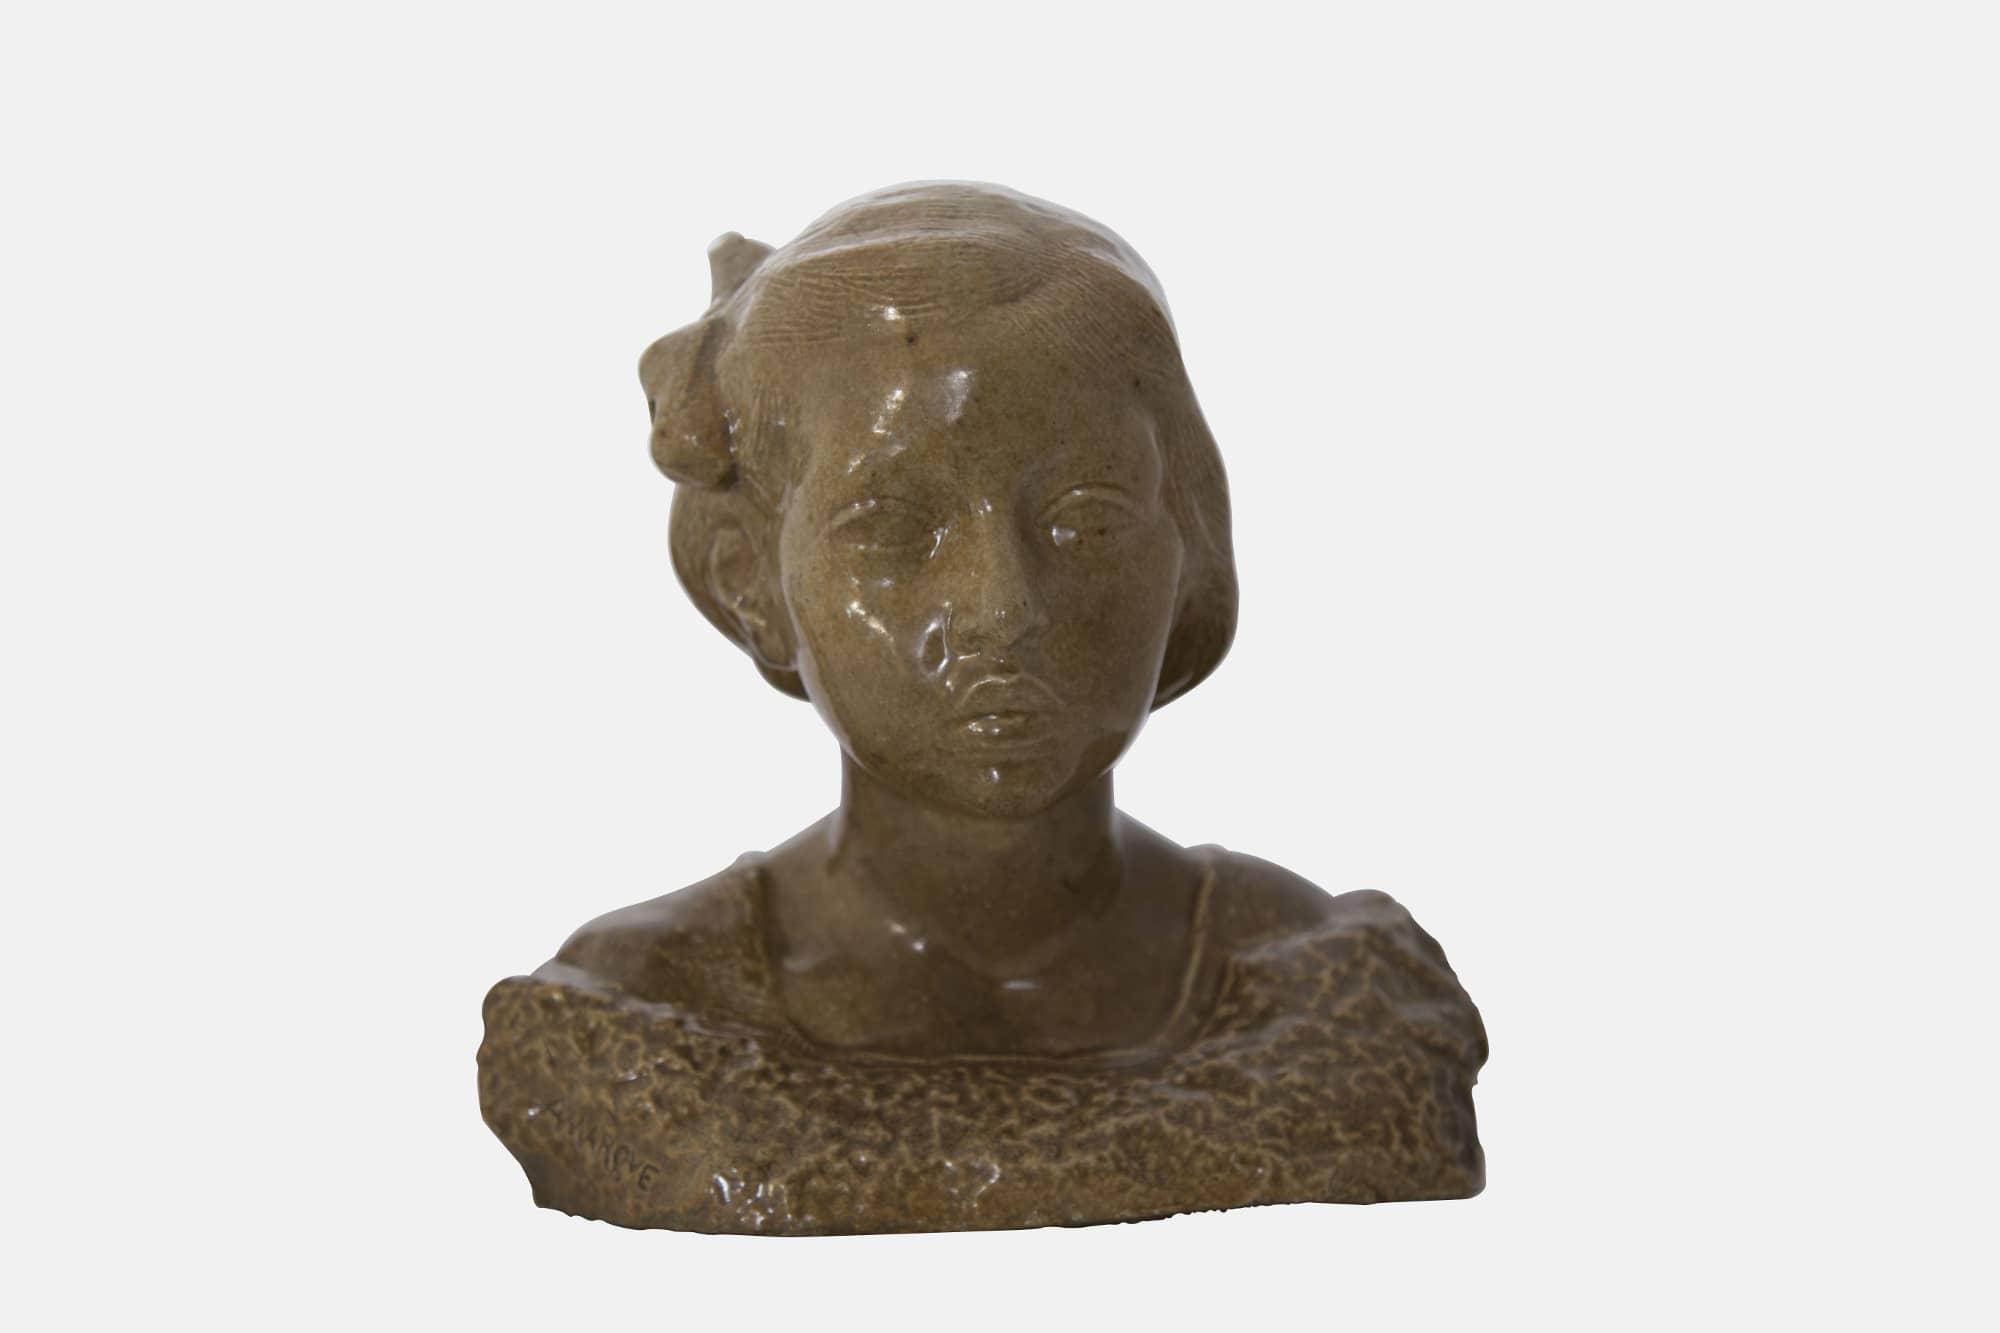 Buste de Marthe Lebasque, fille du peintre Henri Lebasque